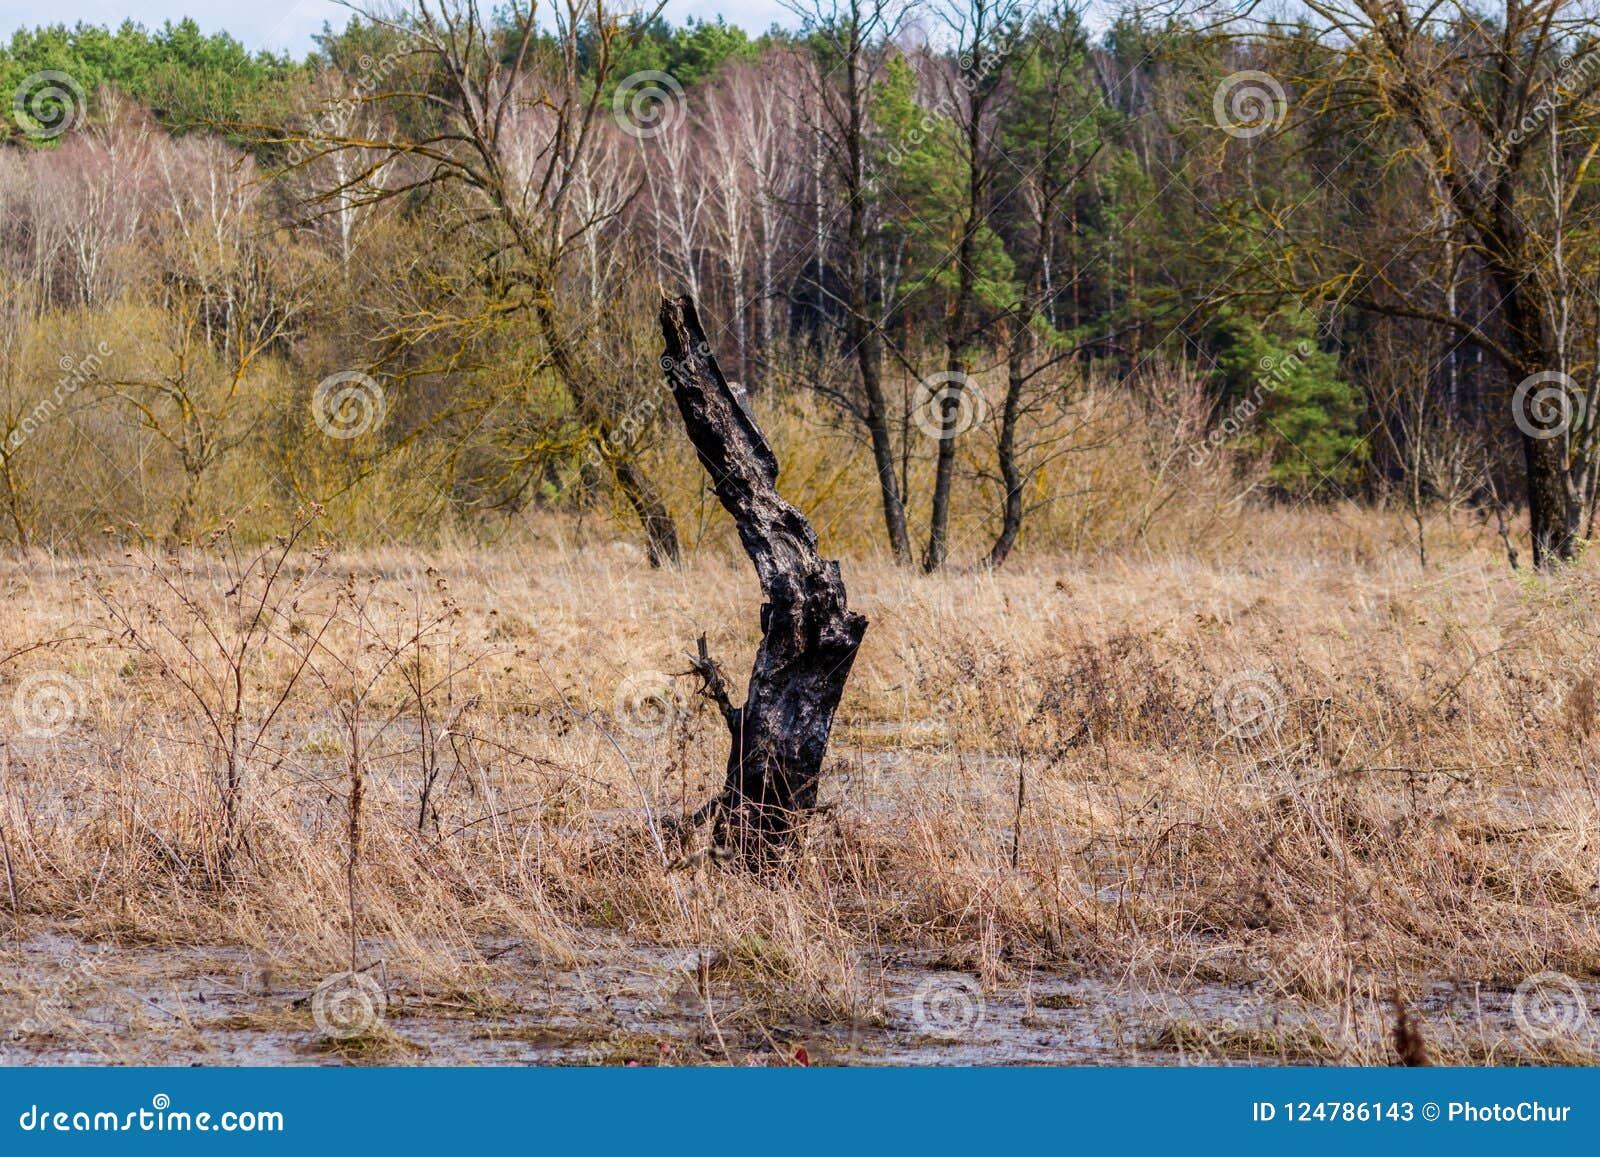 Remainder of burnt wood in wetlands